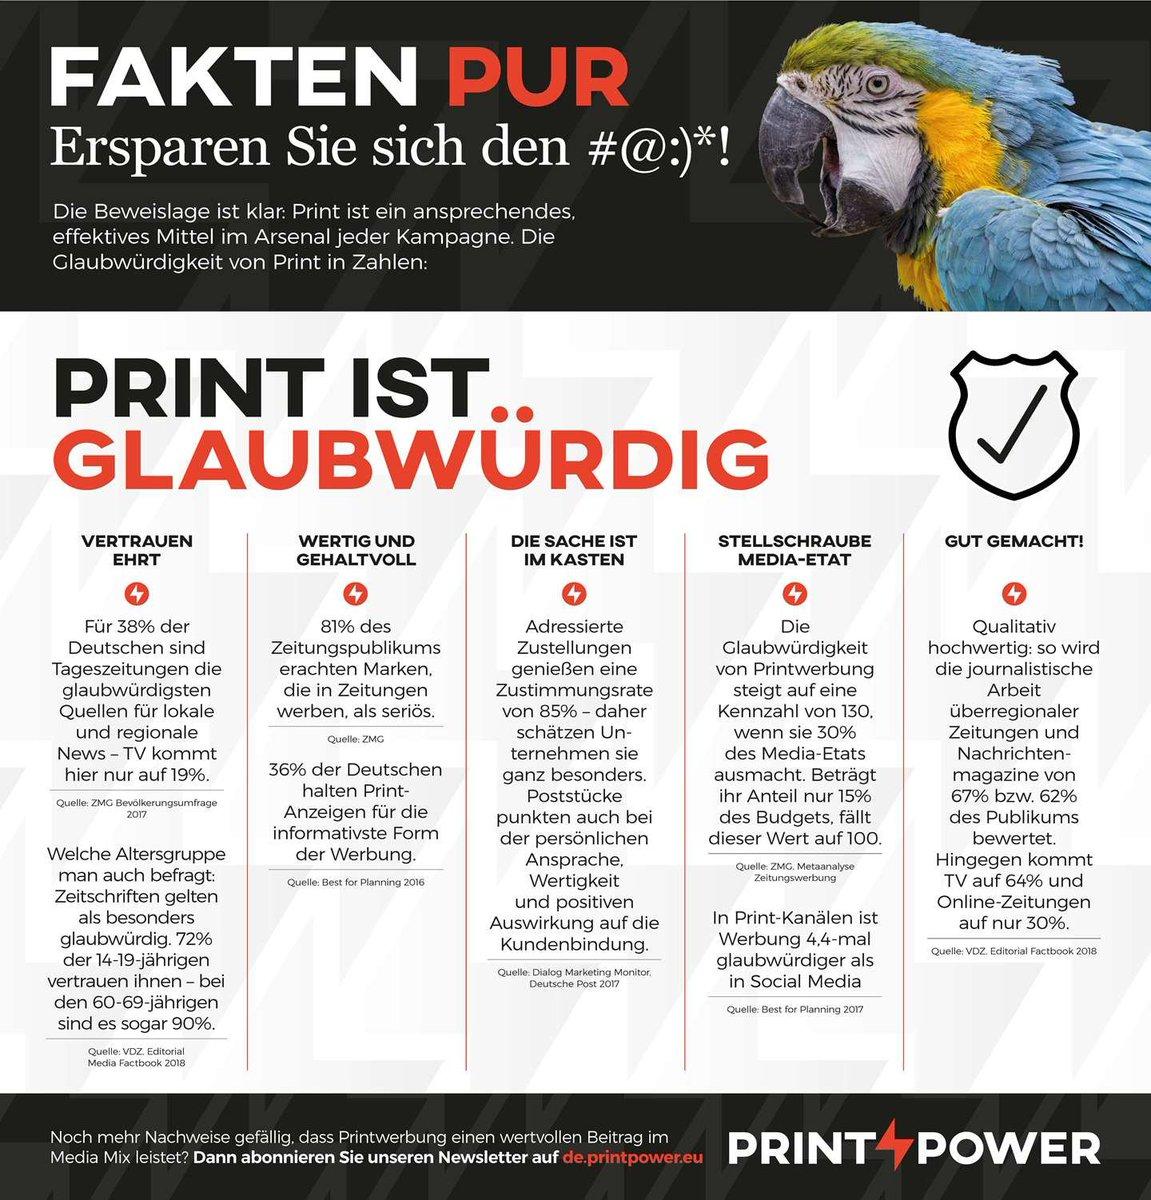 PrintPower photo